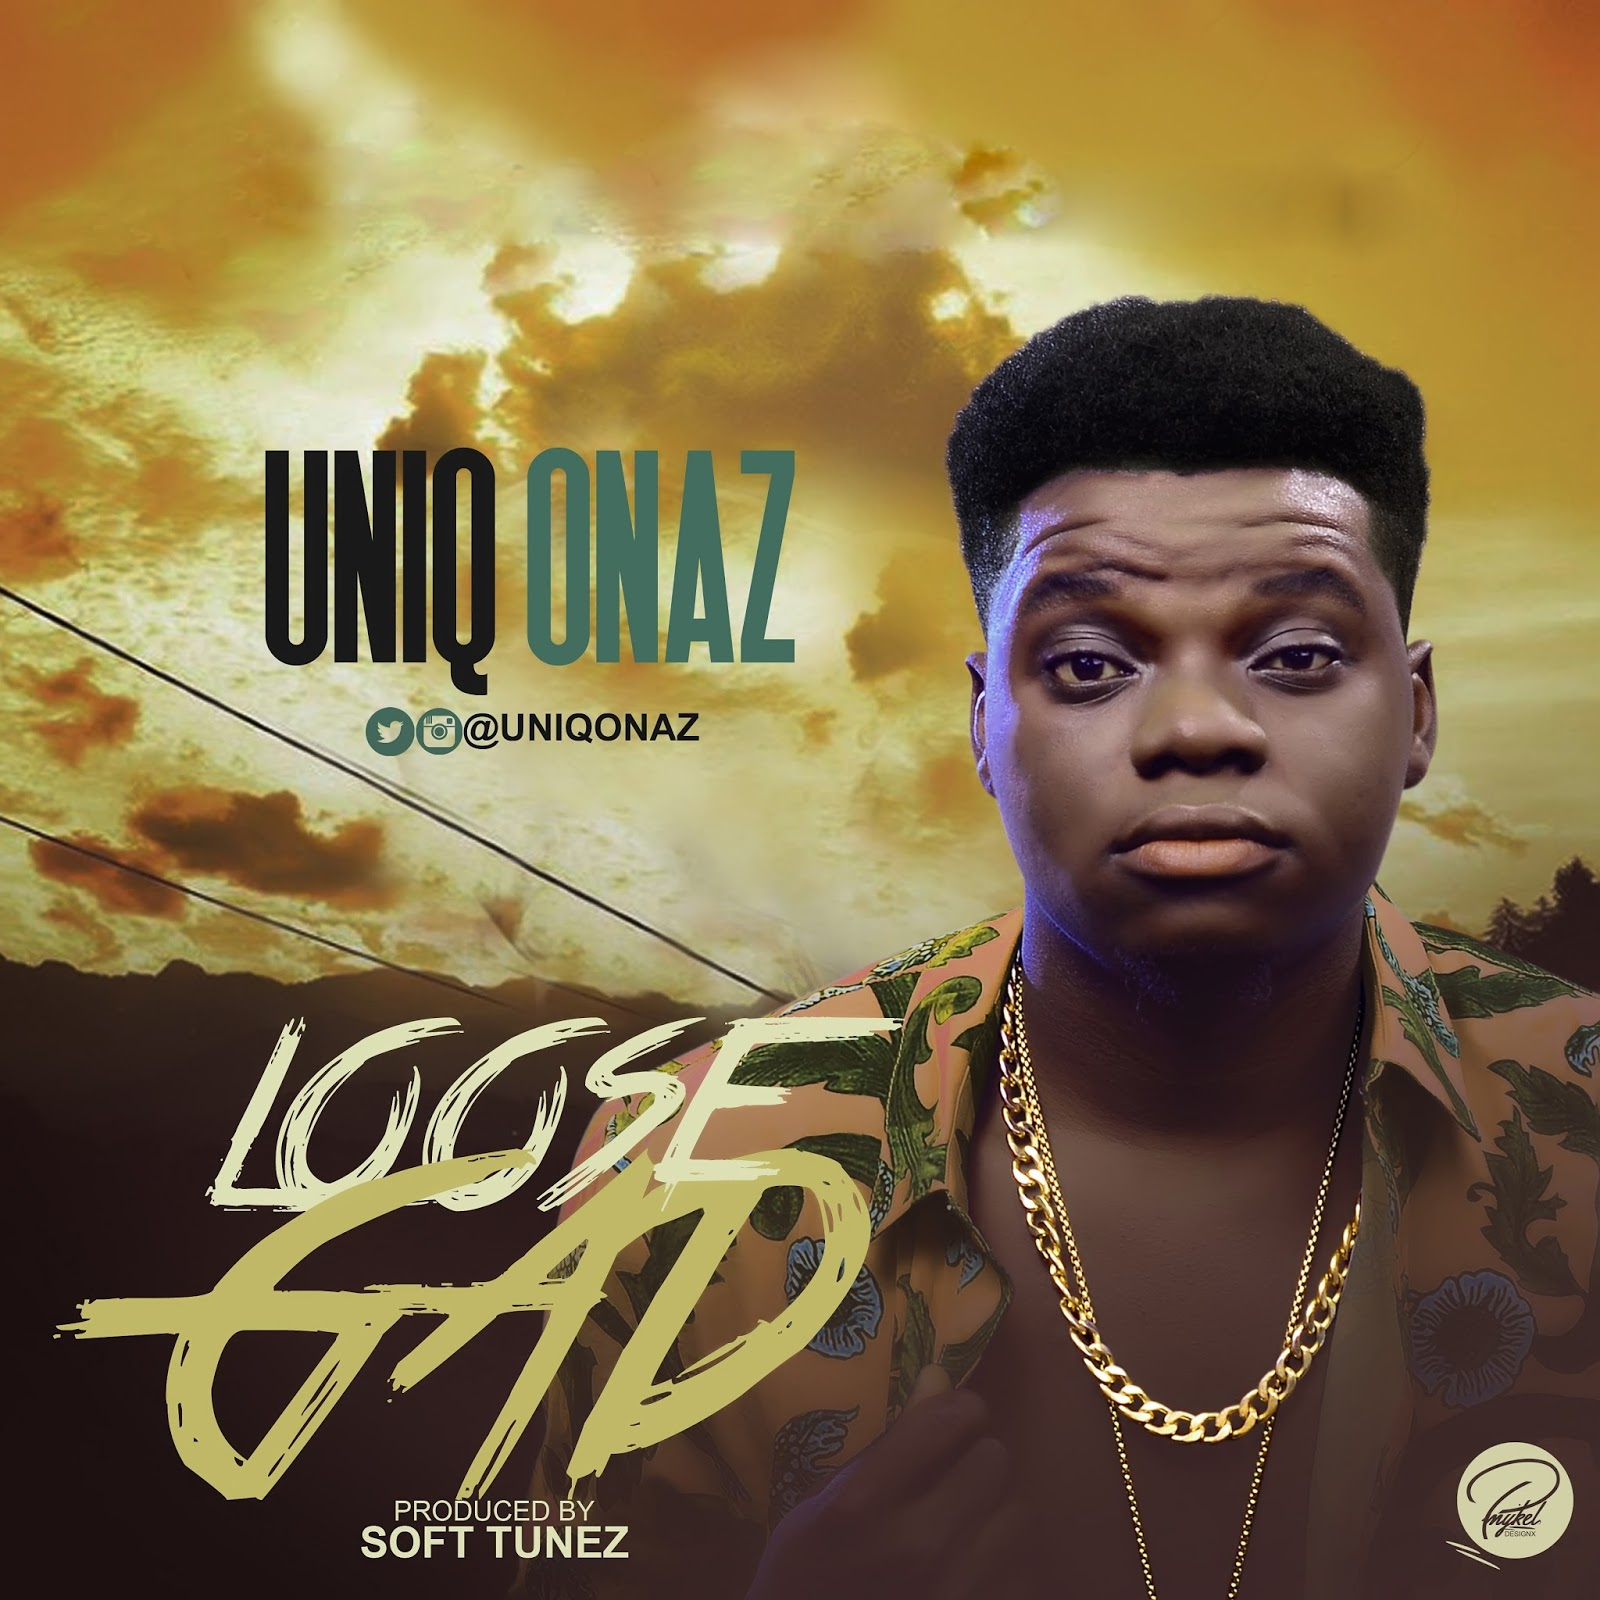 Music: Uniq Onaz - Loose Gad (Prod. Soft Tunez) | @Uniqonaz